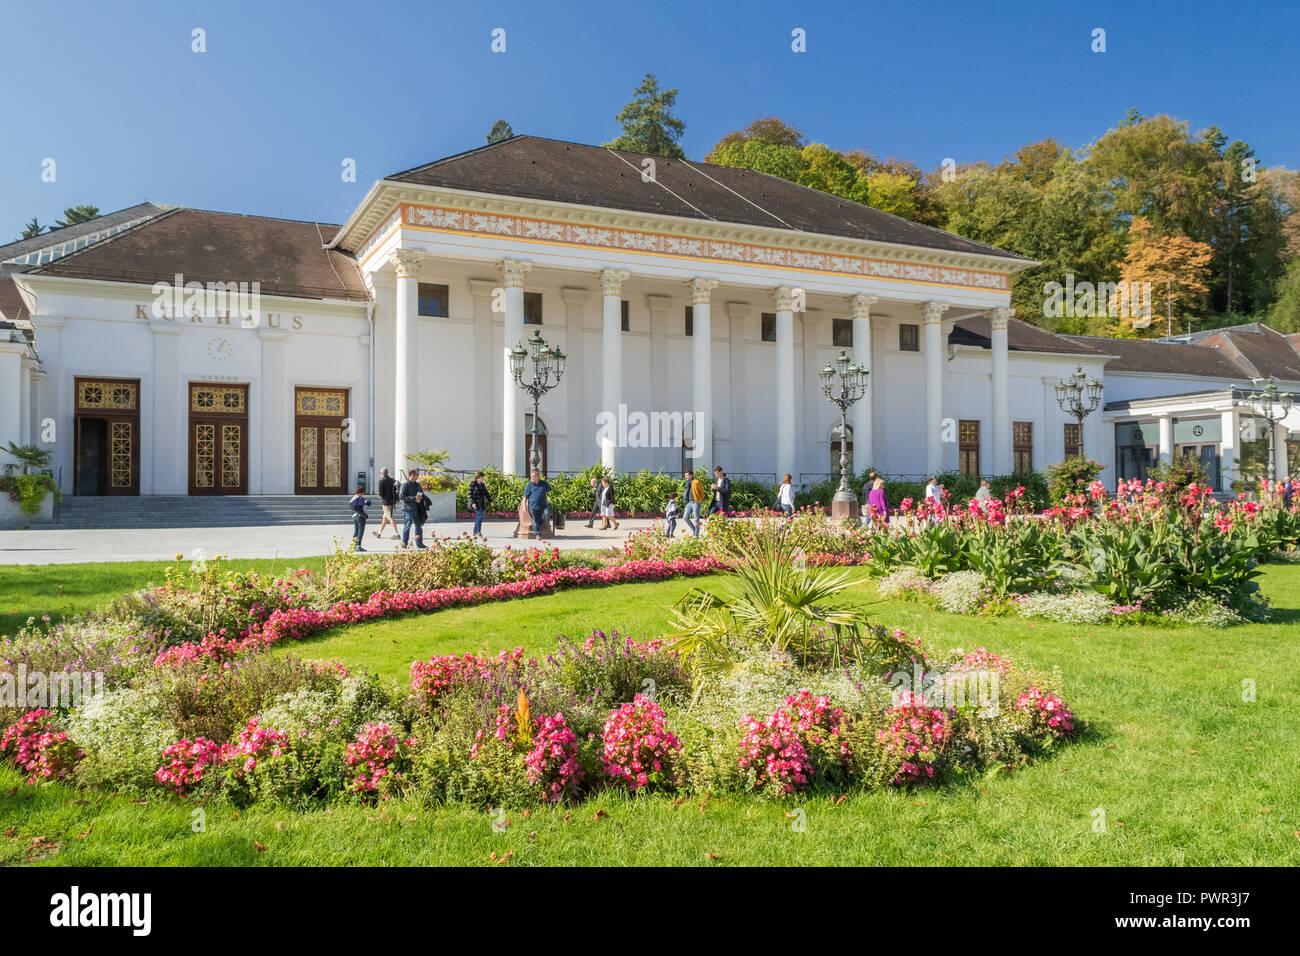 Baden Baden Kurhause Casino Spa Resort and Conference Complex, Baden Baden, Germany, Europe - Stock Image